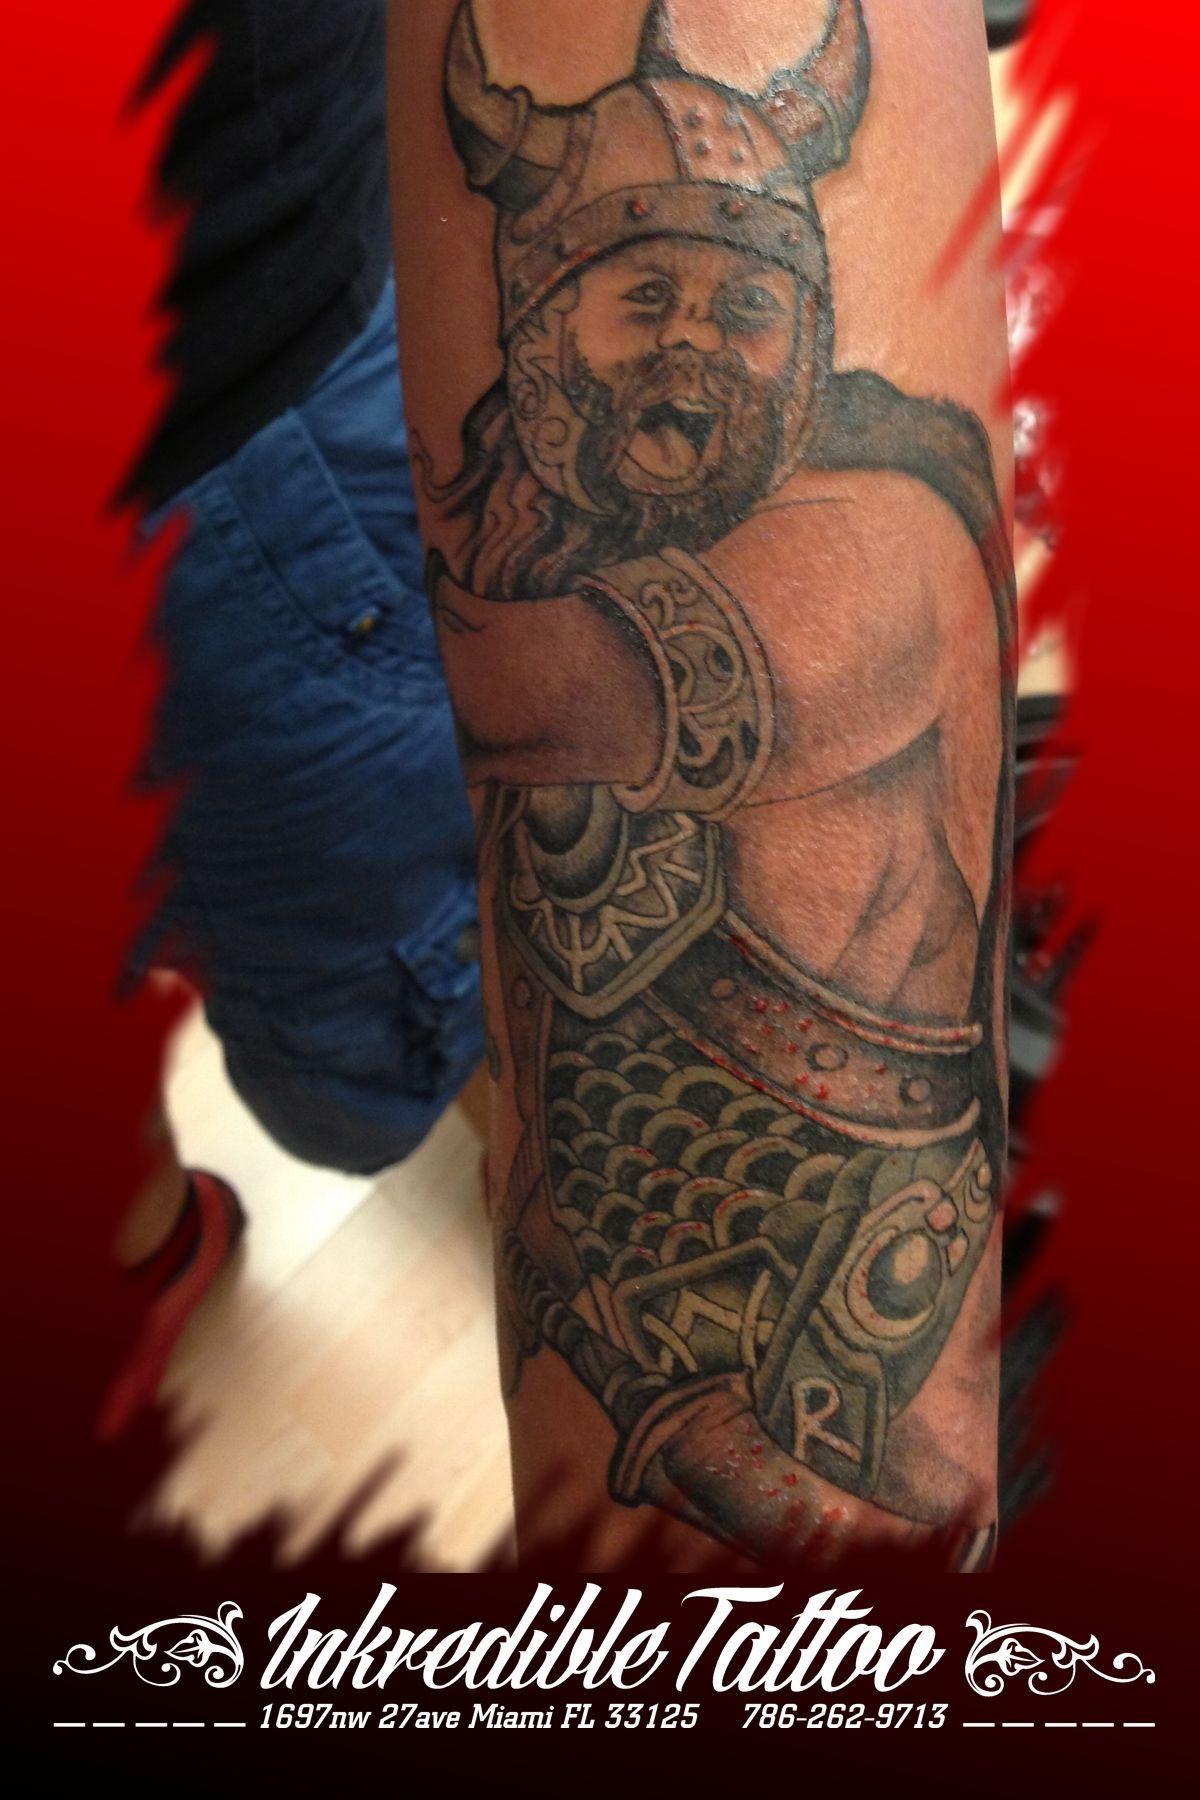 1697nw 27ave miami fl 33125 7862629713 portrait tattoo